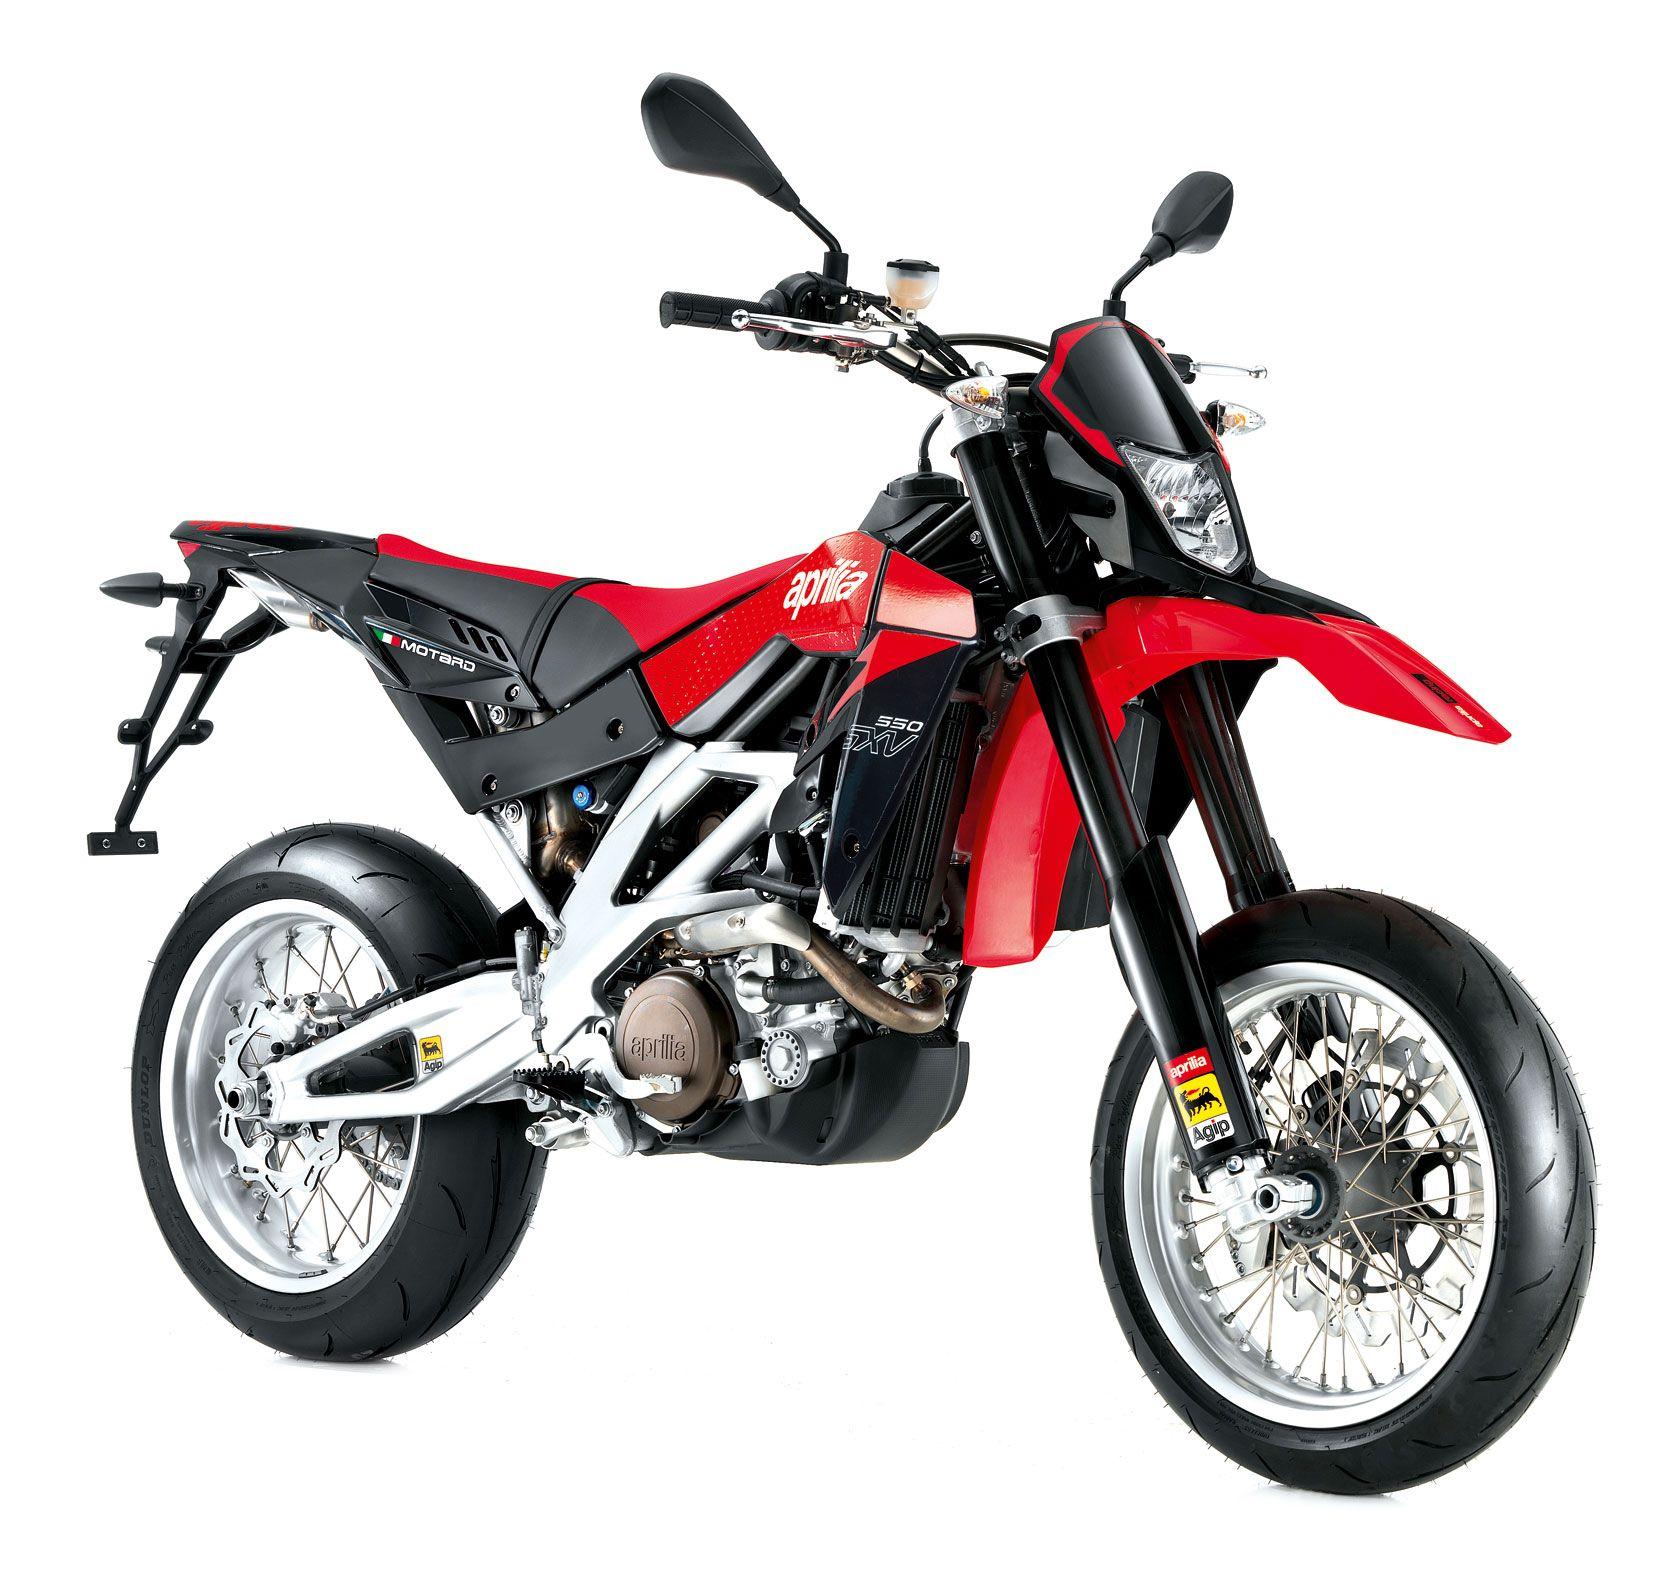 2011 Aprilia Sxv 450 2012 2013 New Motorcycles Classic Price